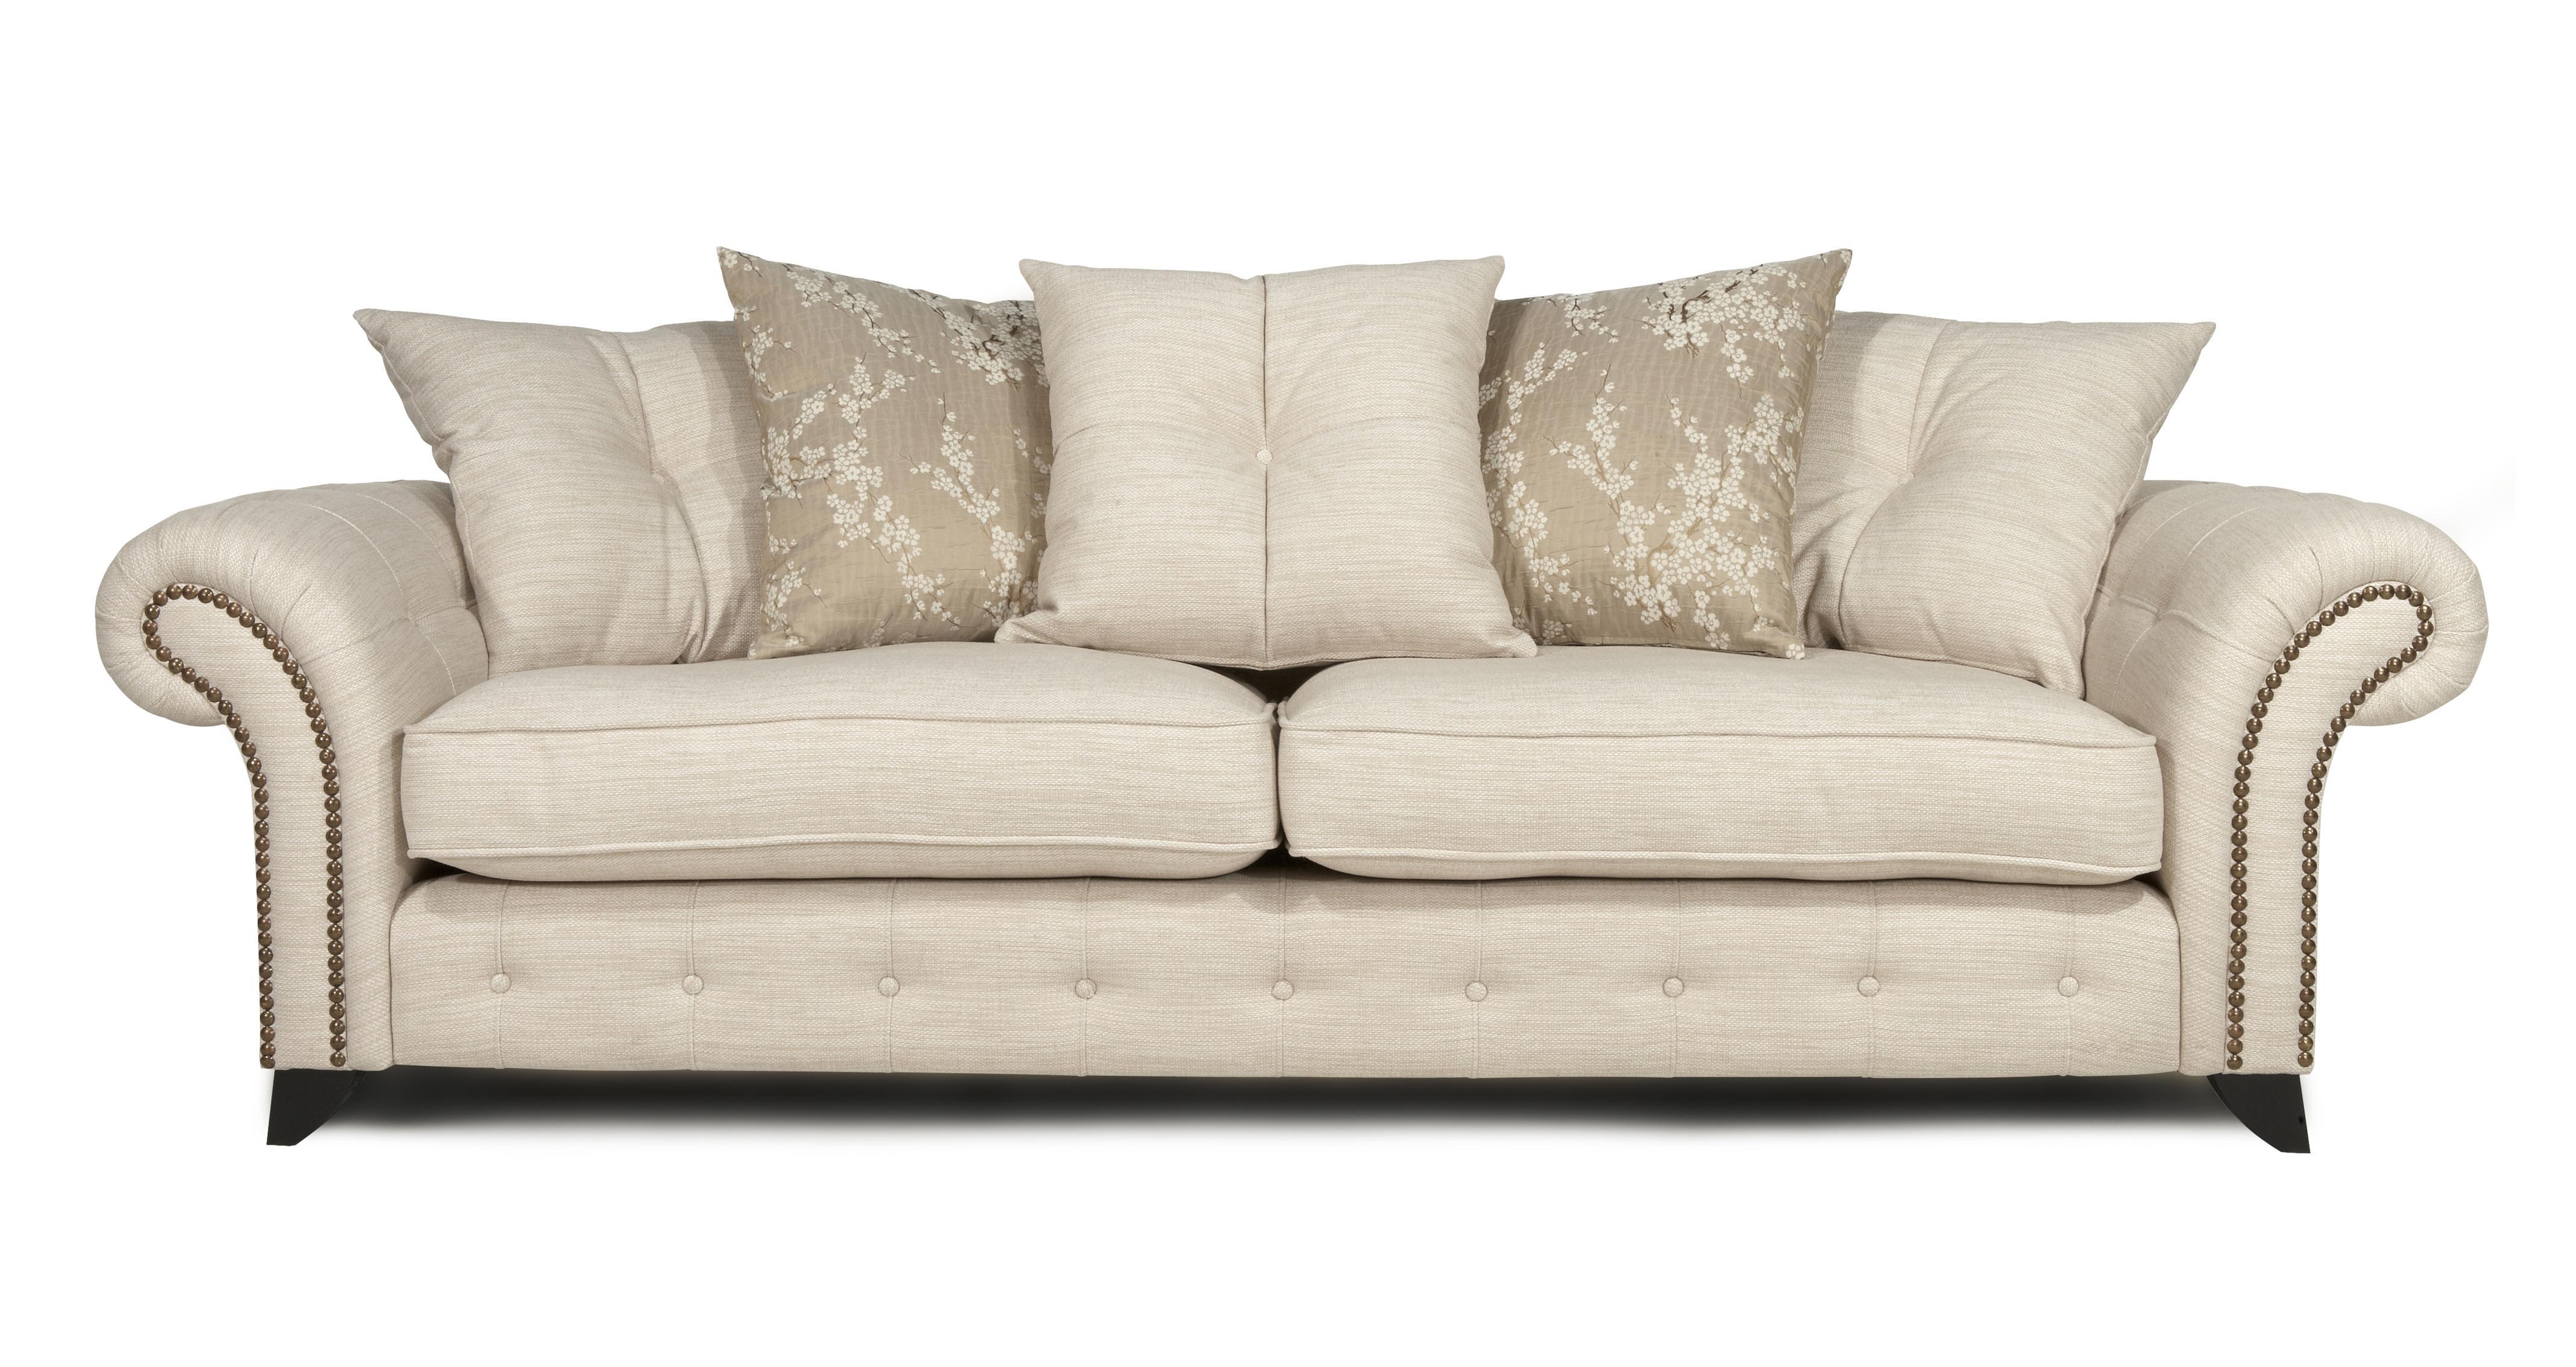 cream soft fabric sofa and chaise lounge covers dfs akasha set inc 4 seater 2